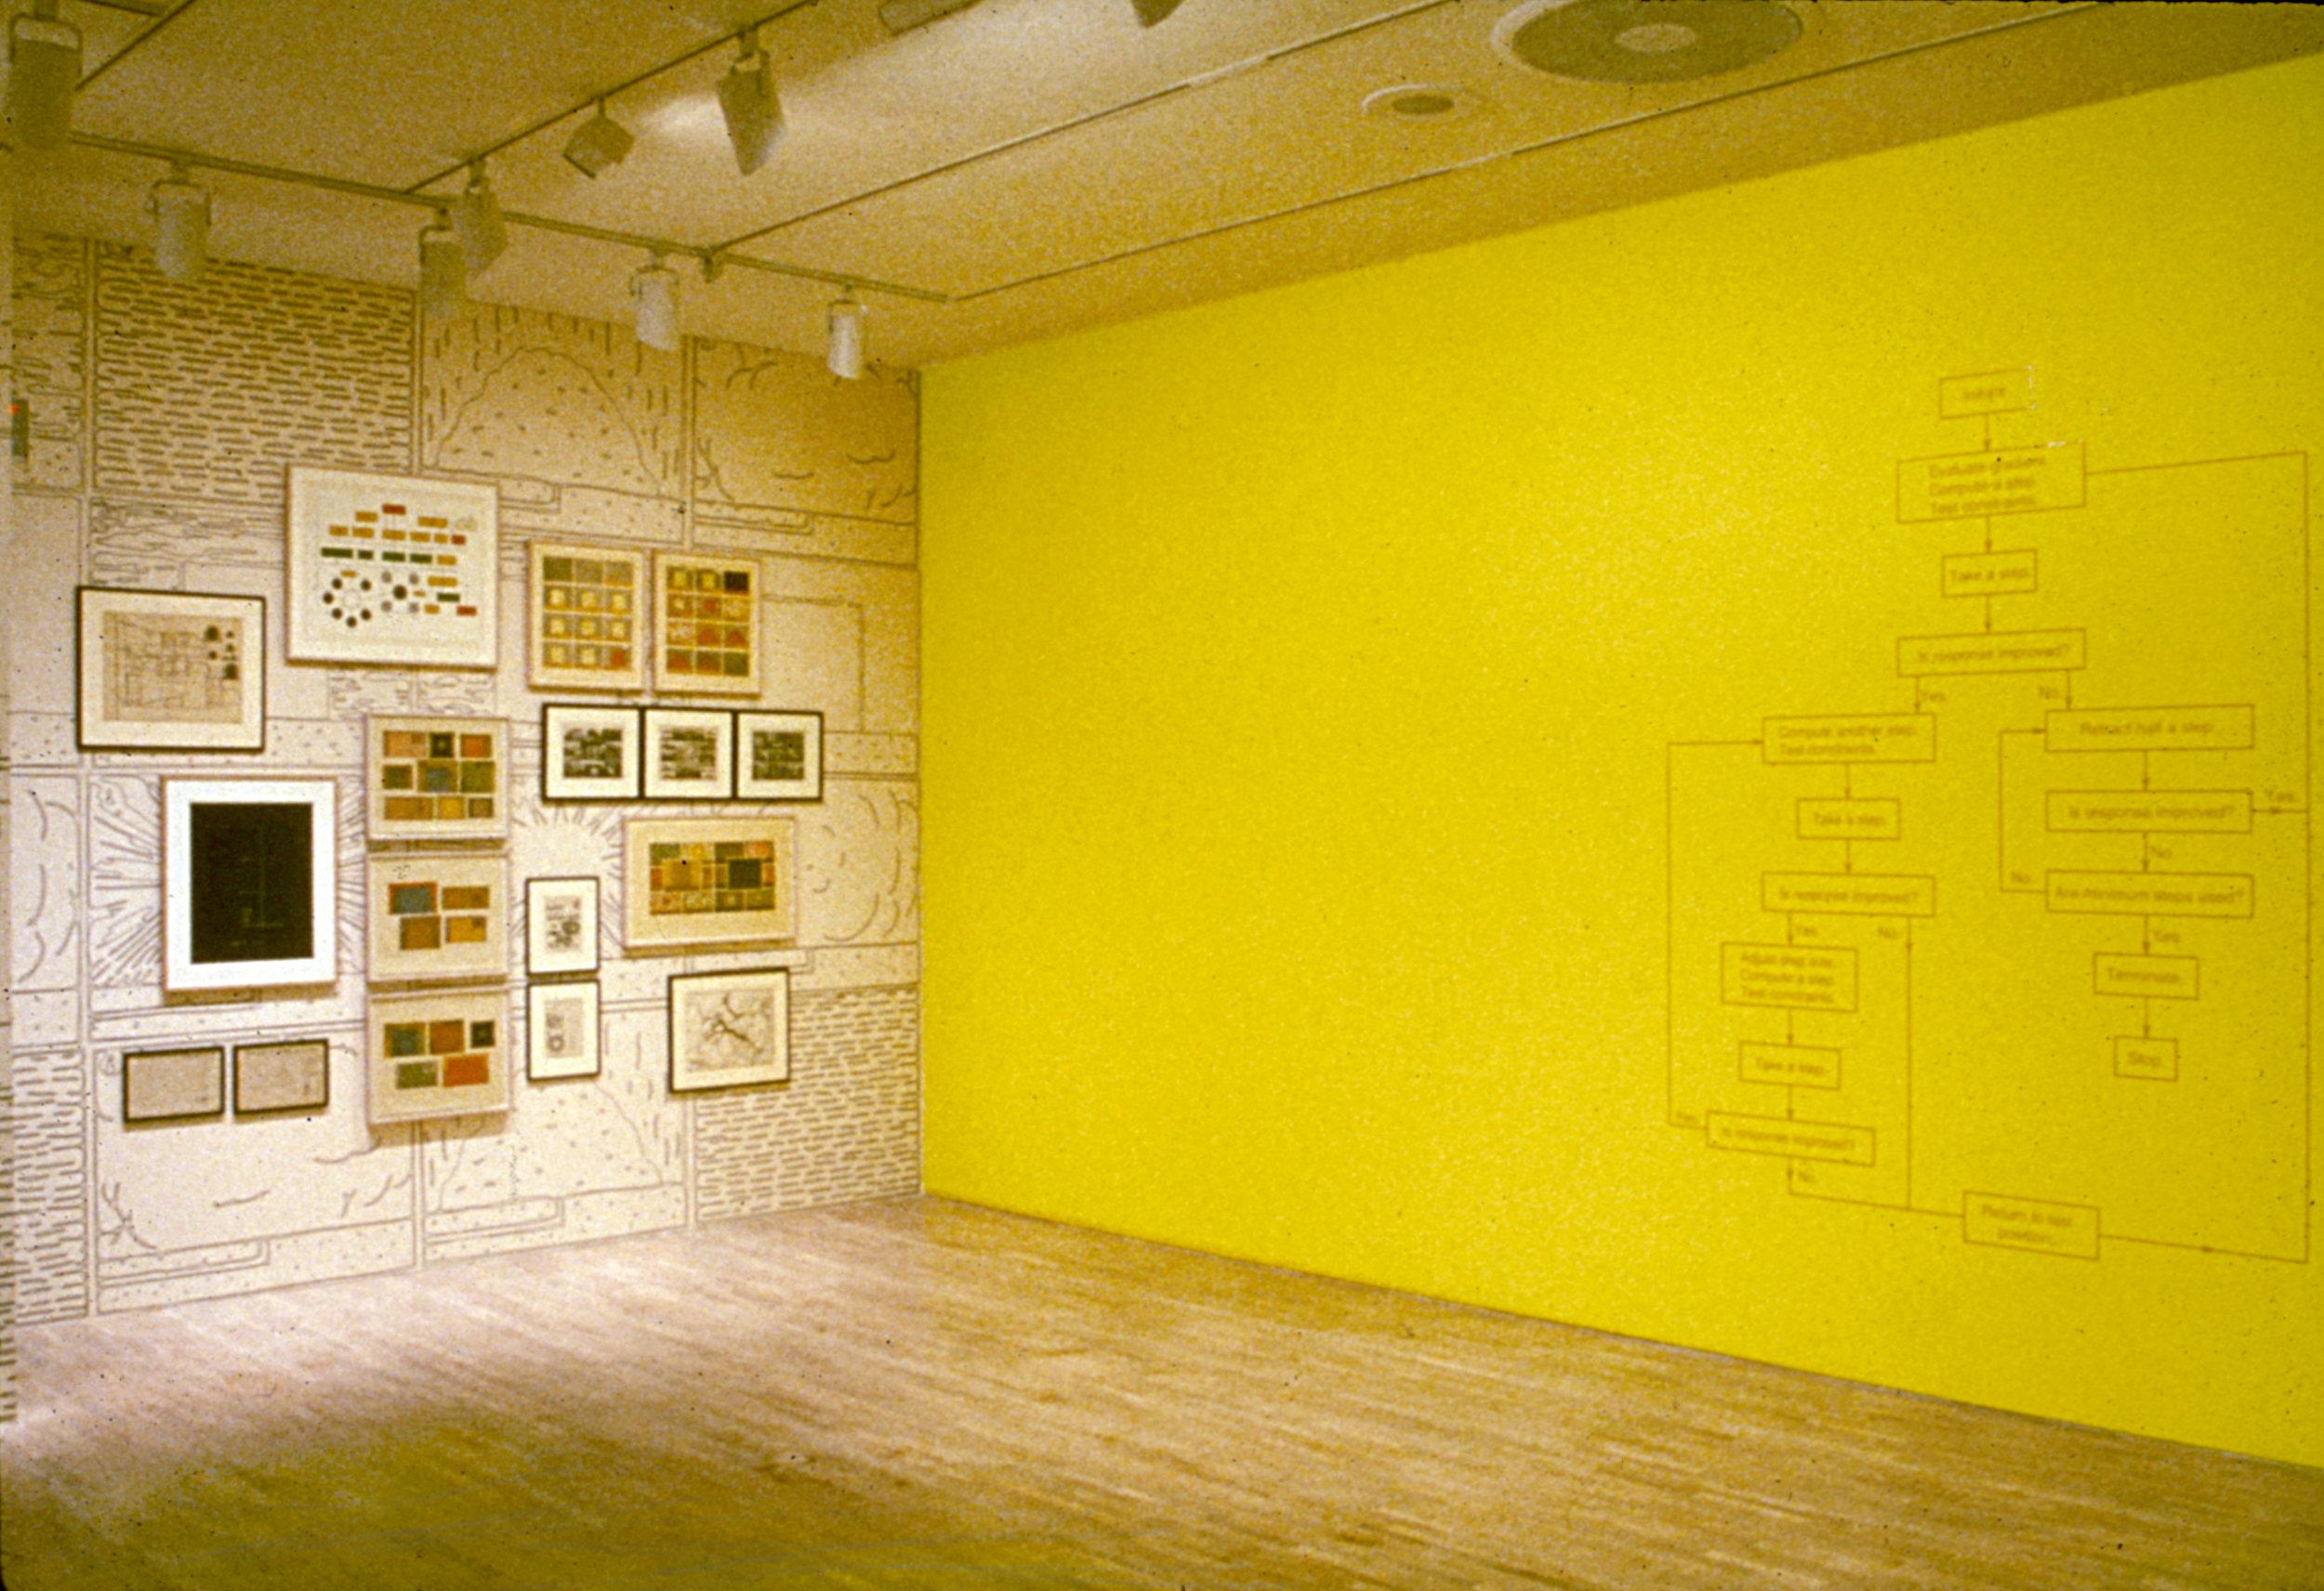 MoMA NY 1997 05 170.8M-RESCAN_EDITED11-6-09.jpg